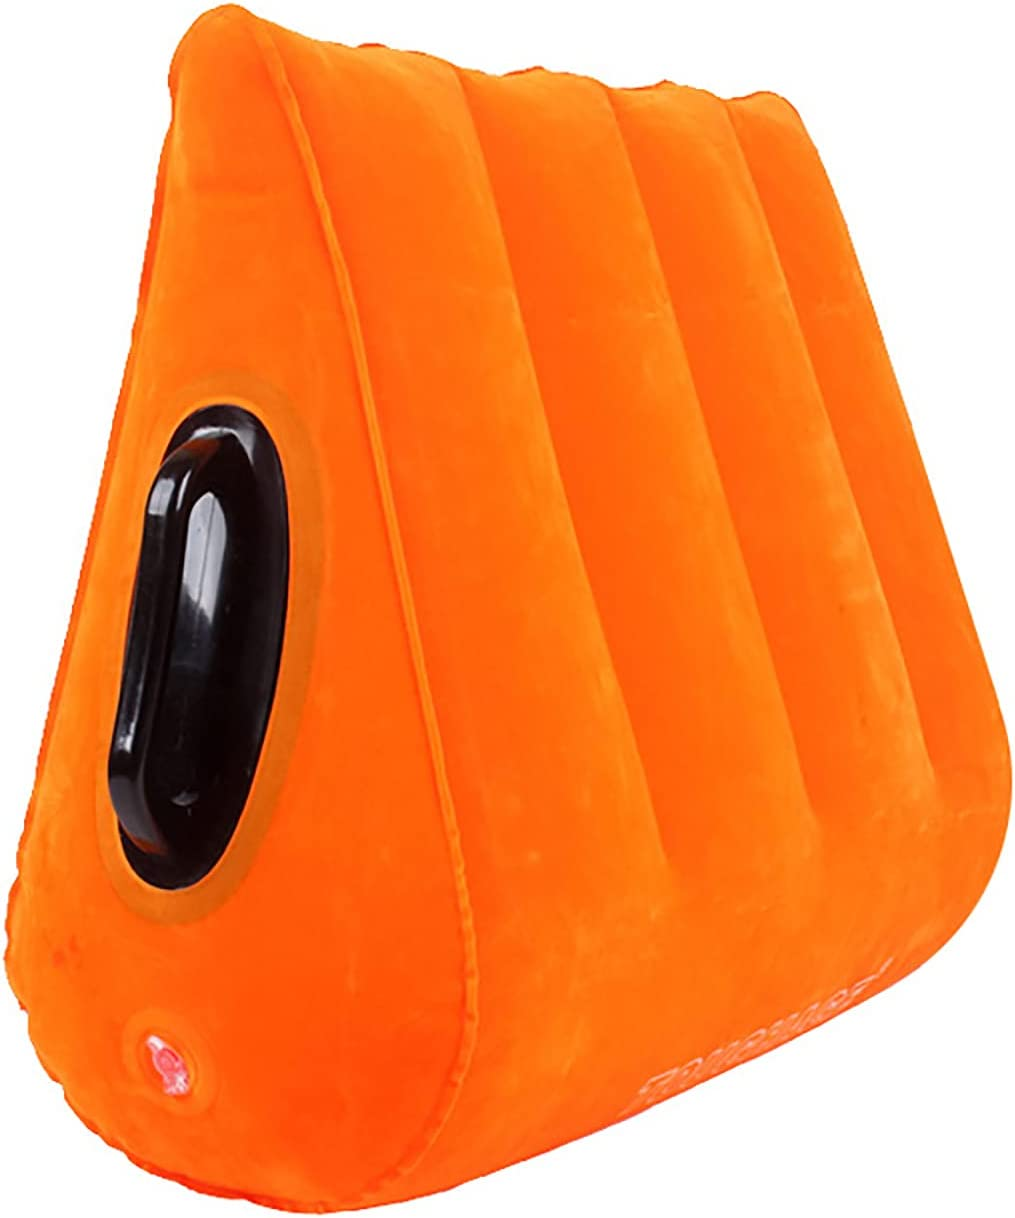 Inflatable Lǐbërâtőr Wedge for Wholesale Pillow Super popular specialty store Orange